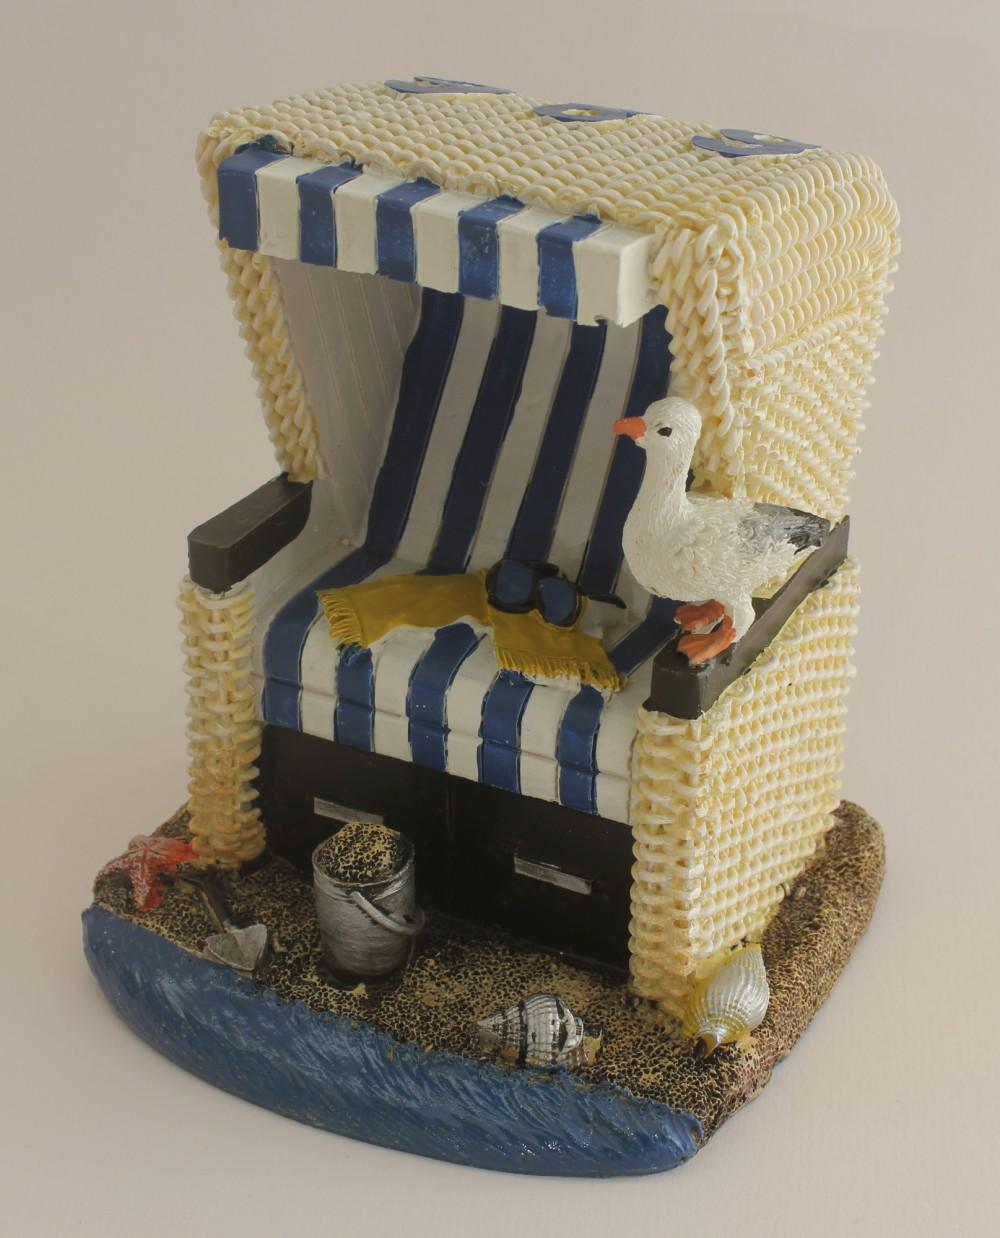 strandkorb deko blau wei 12 cm wohnaccessoires deko. Black Bedroom Furniture Sets. Home Design Ideas